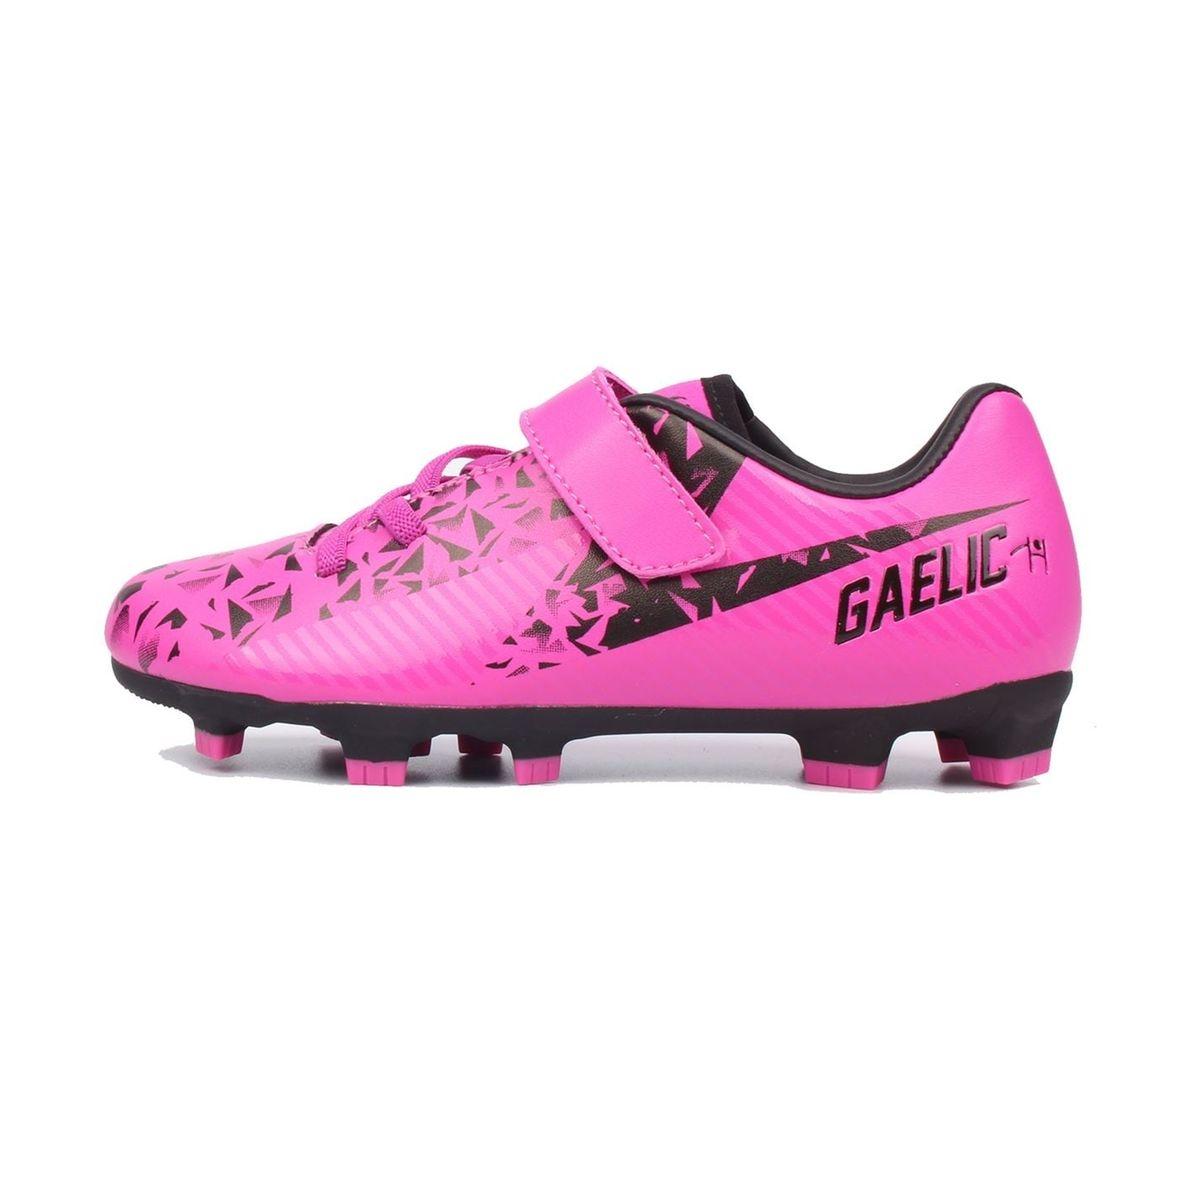 Chaussures de foot sol dur